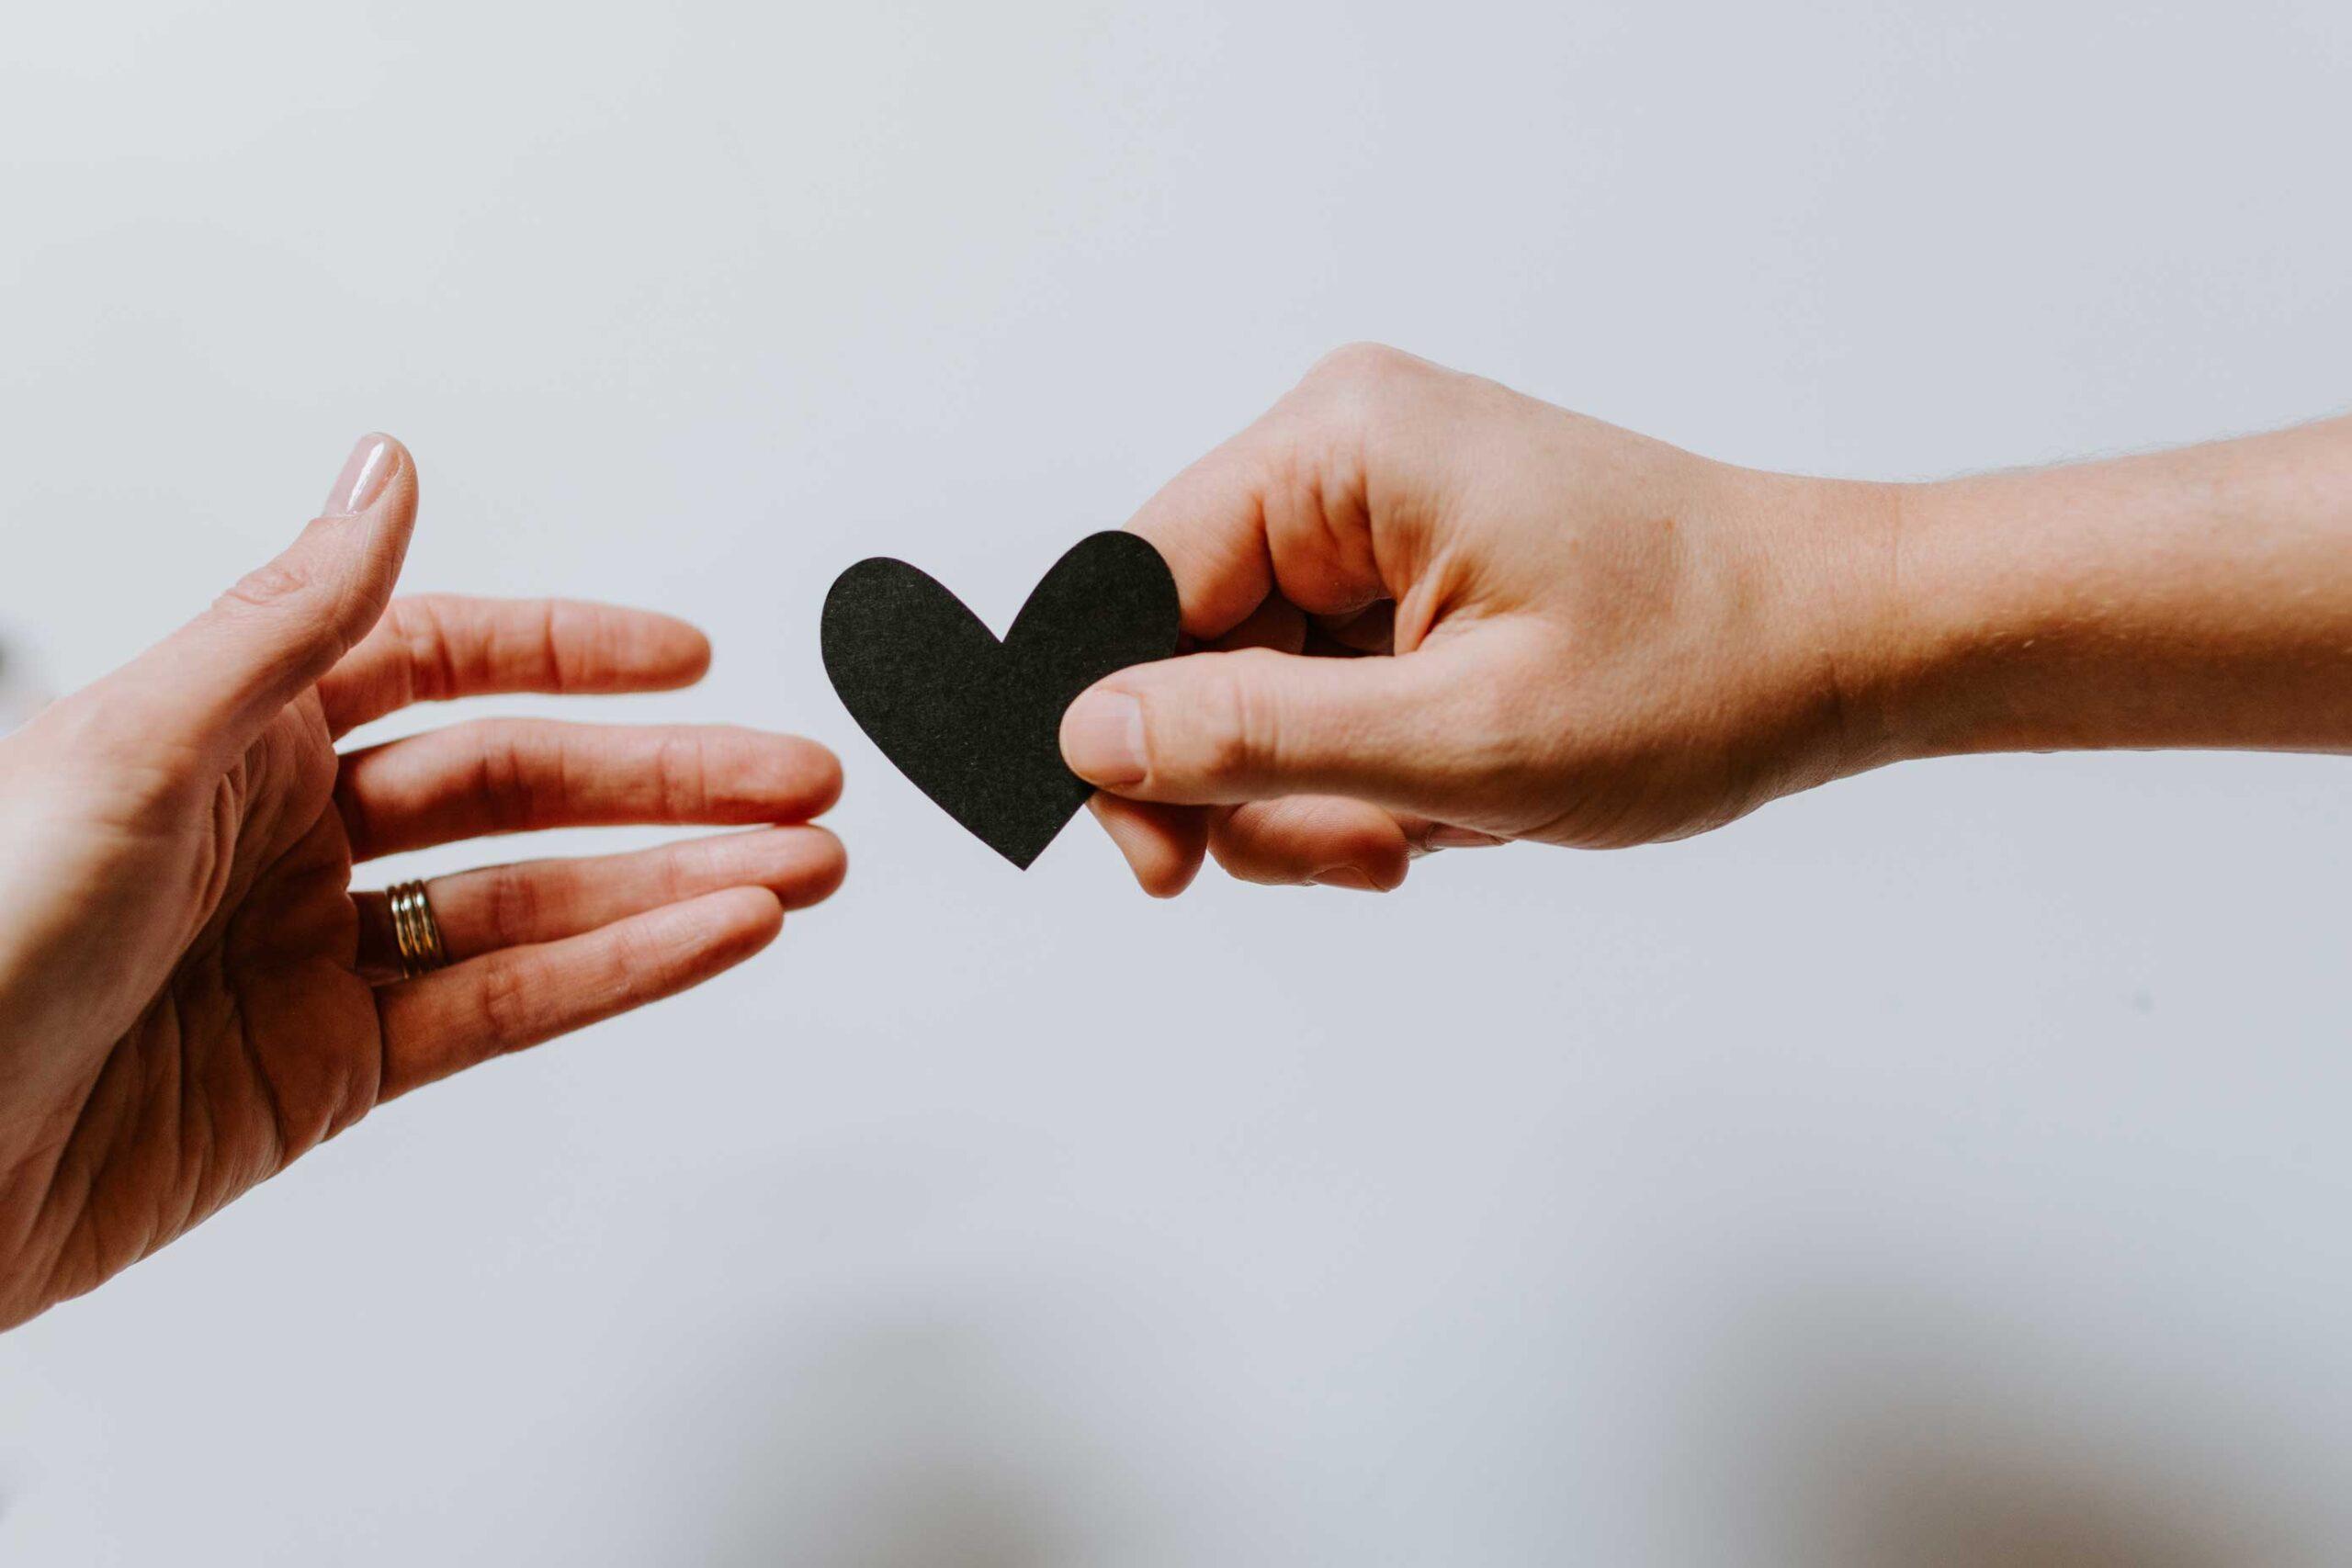 Humain, mains et coeur